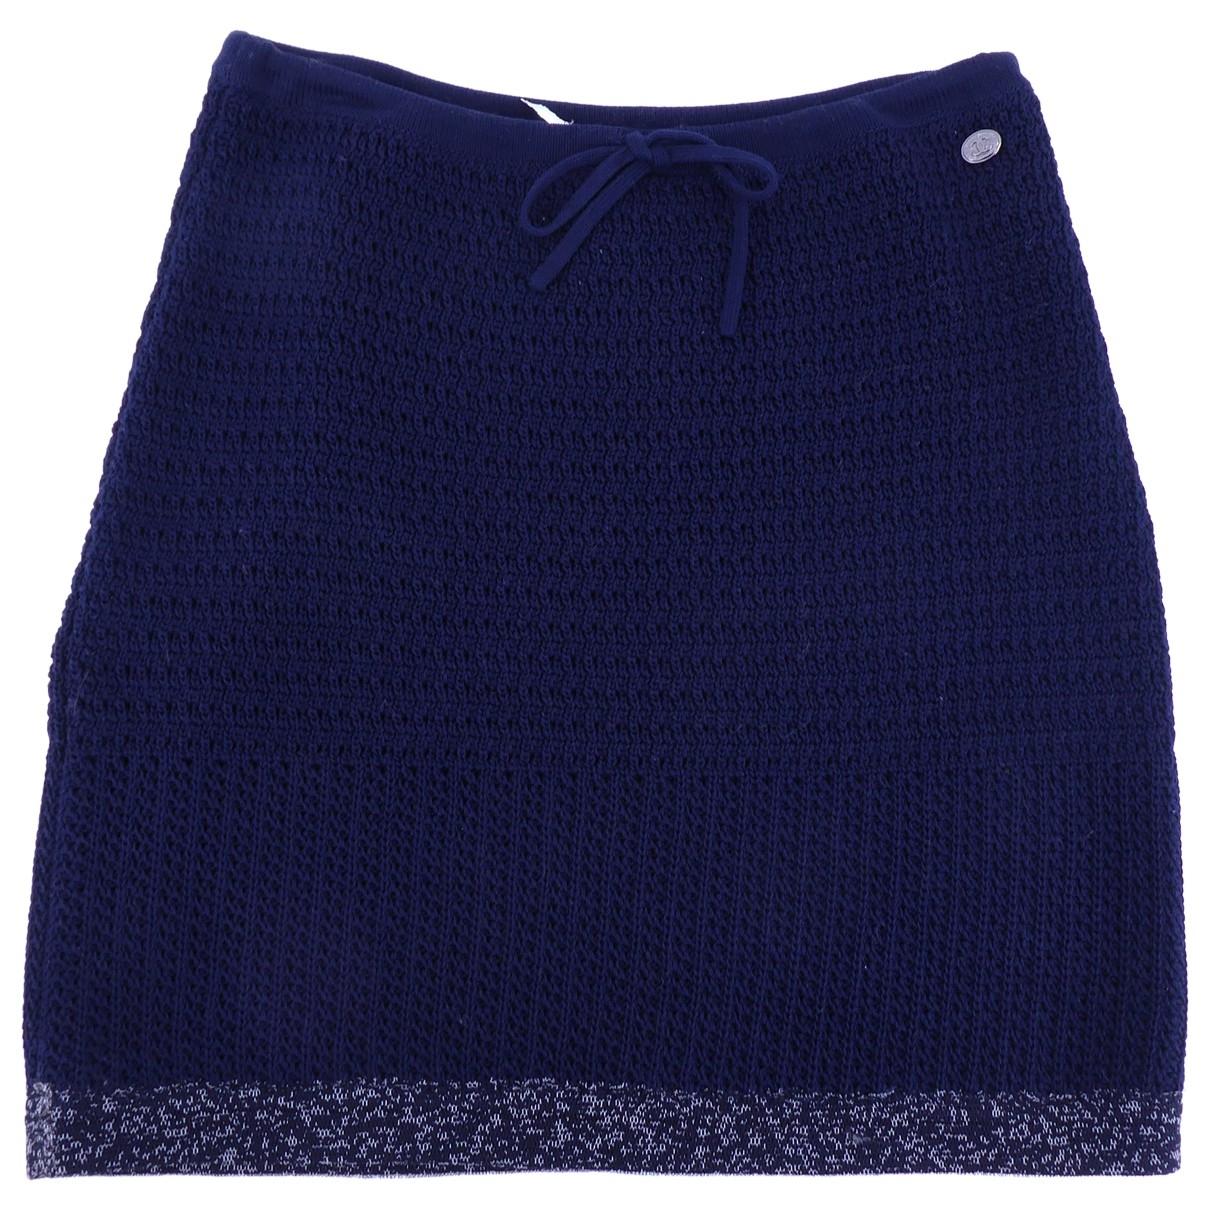 Chanel \N Blue Cotton skirt for Women 38 IT